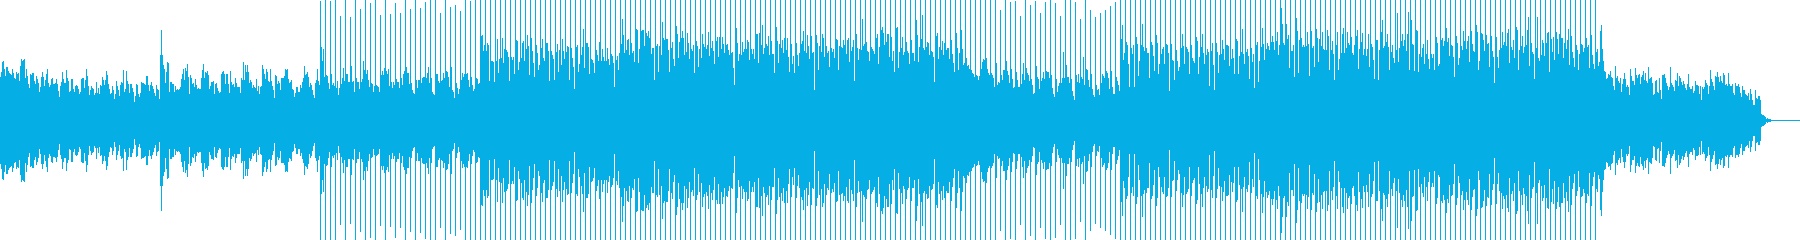 EDMクラブ系ダンスミュージック-14の再生済みの波形